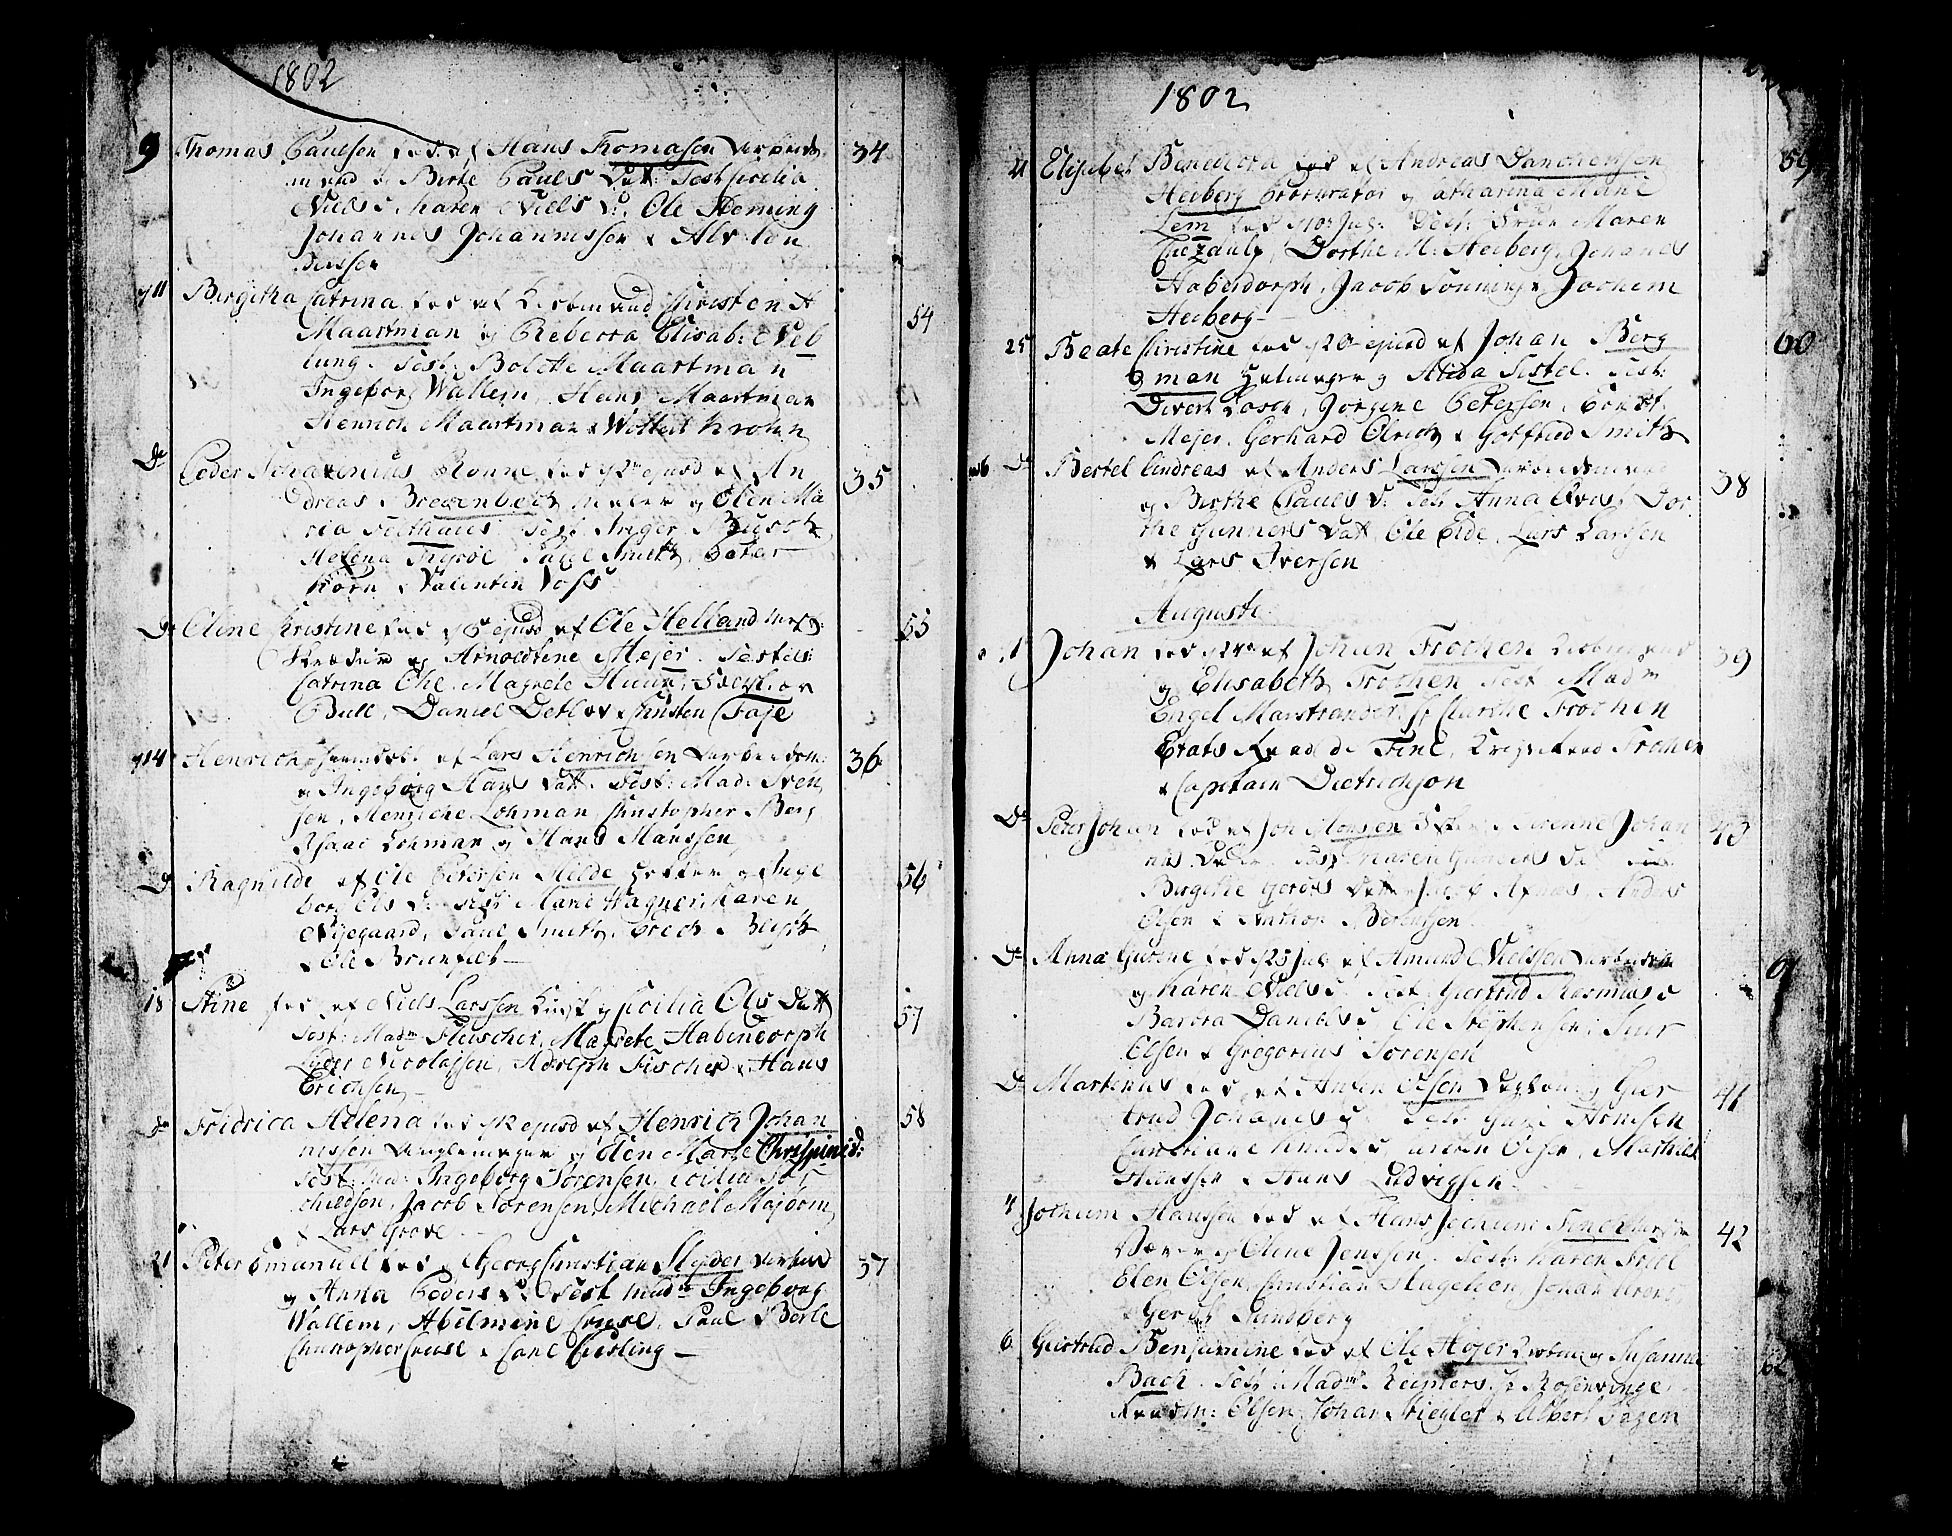 SAB, Domkirken sokneprestembete, H/Haa/L0004: Ministerialbok nr. A 4, 1763-1820, s. 278-279